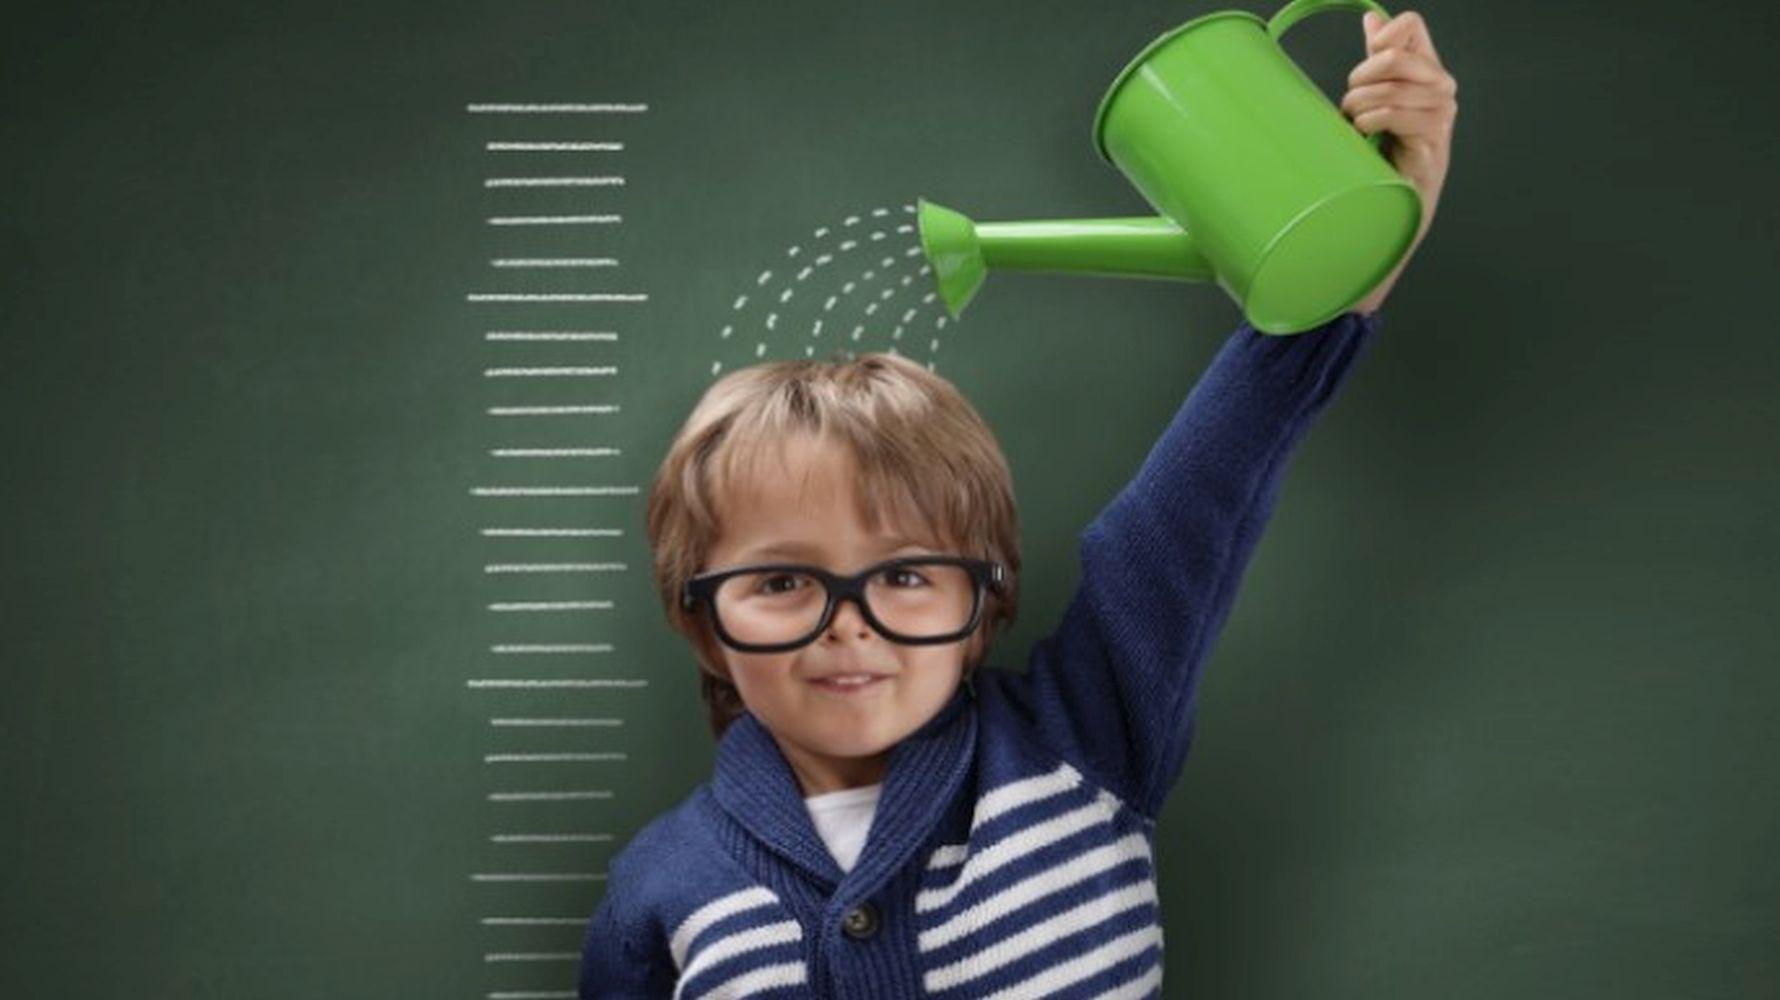 Does drinking milk make the kids taller?